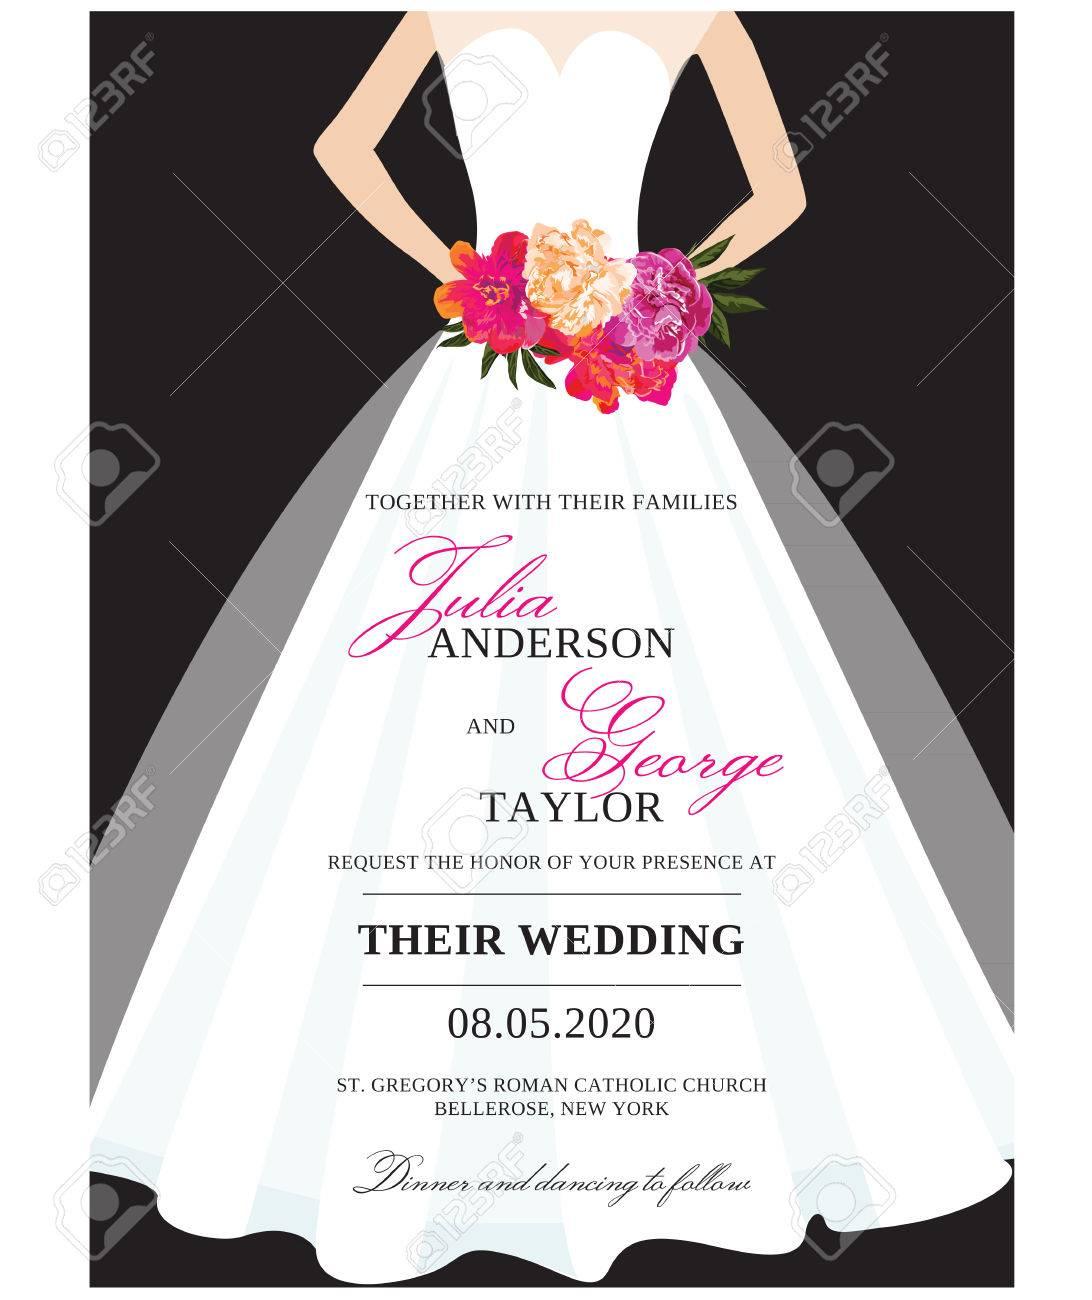 Wedding Invitation Card Stationary With Wedding Dress Royalty Free ...